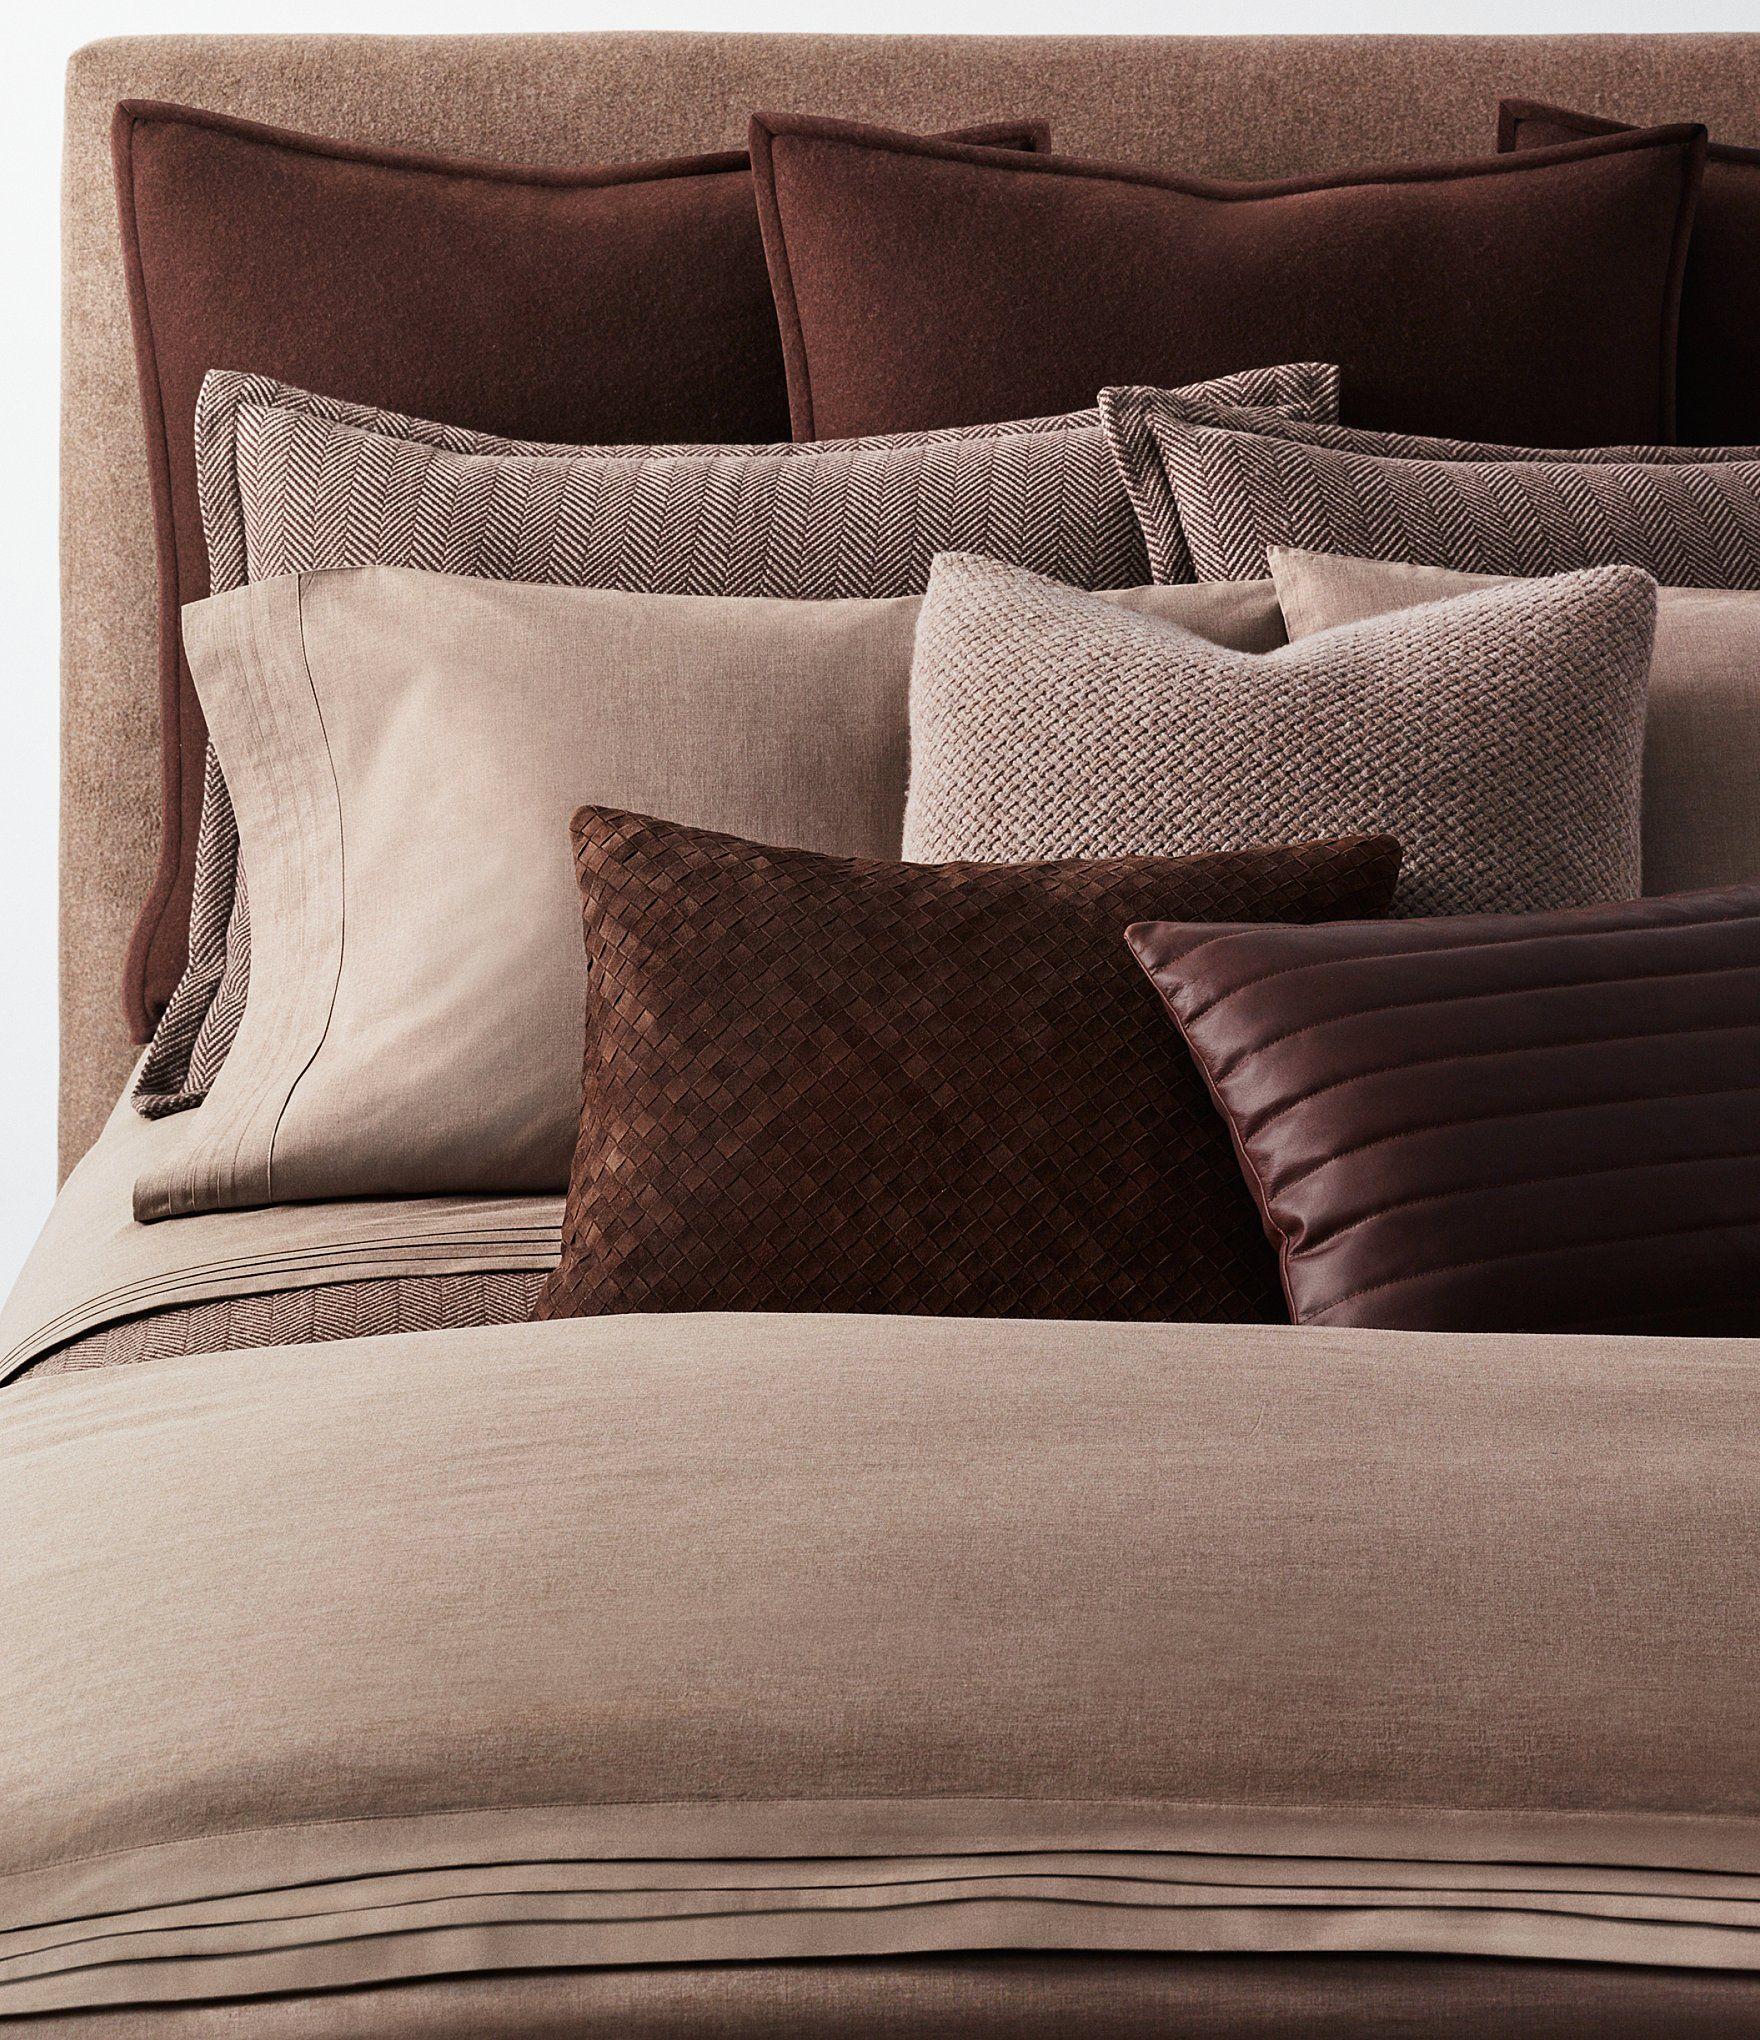 Dillards Home Decor: Ralph Lauren Modern Icons Collection Roth Percale Duvet